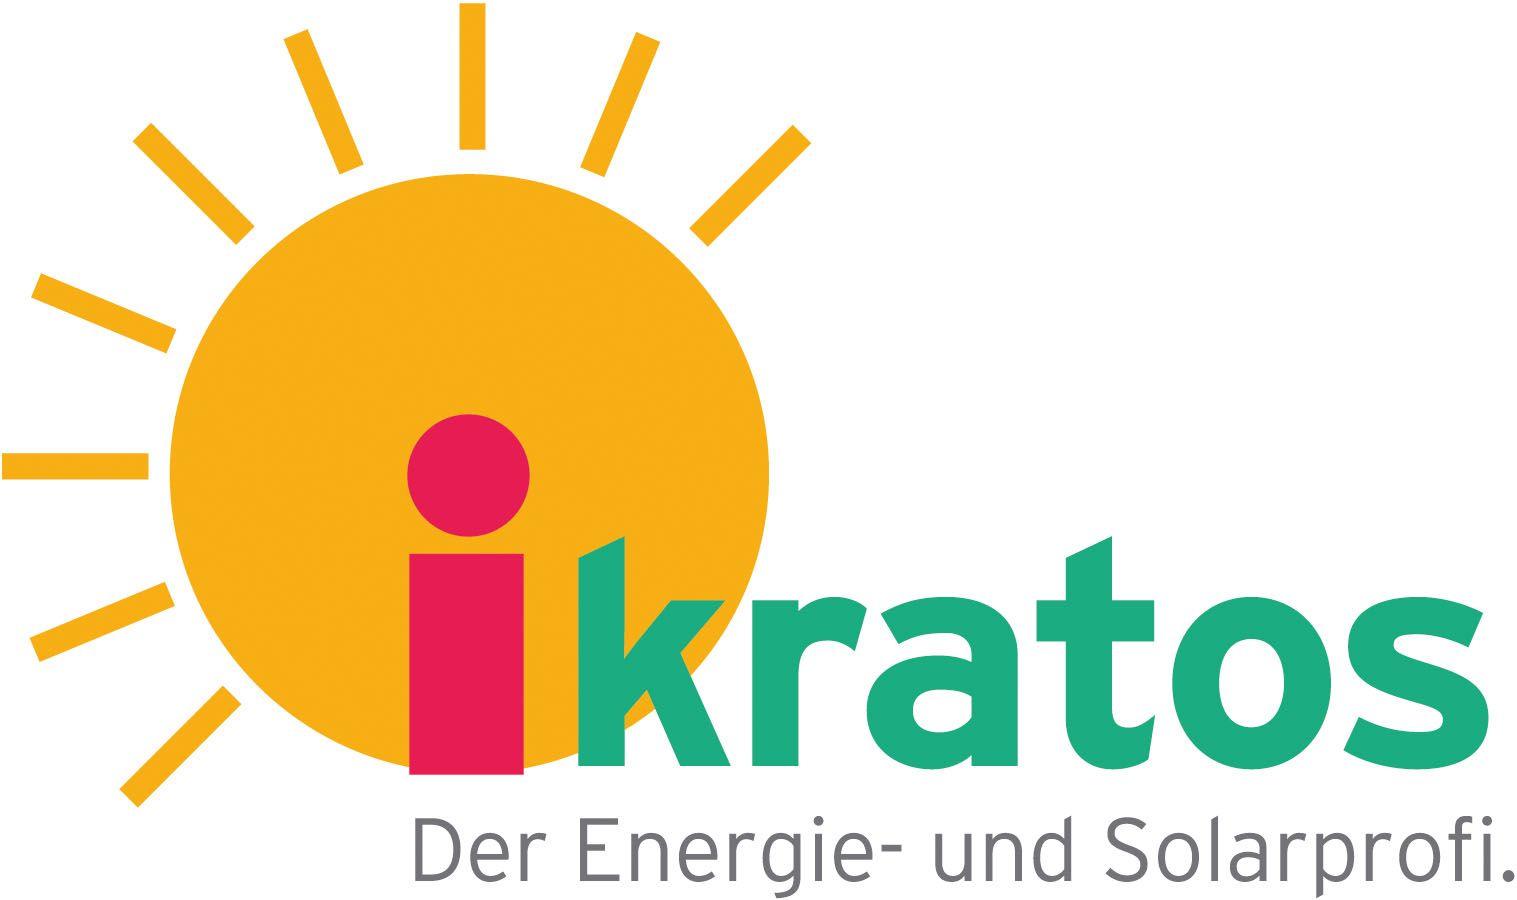 sunpower solar module preis des x21 x22 400 watt solarmodules in deutschland solar. Black Bedroom Furniture Sets. Home Design Ideas